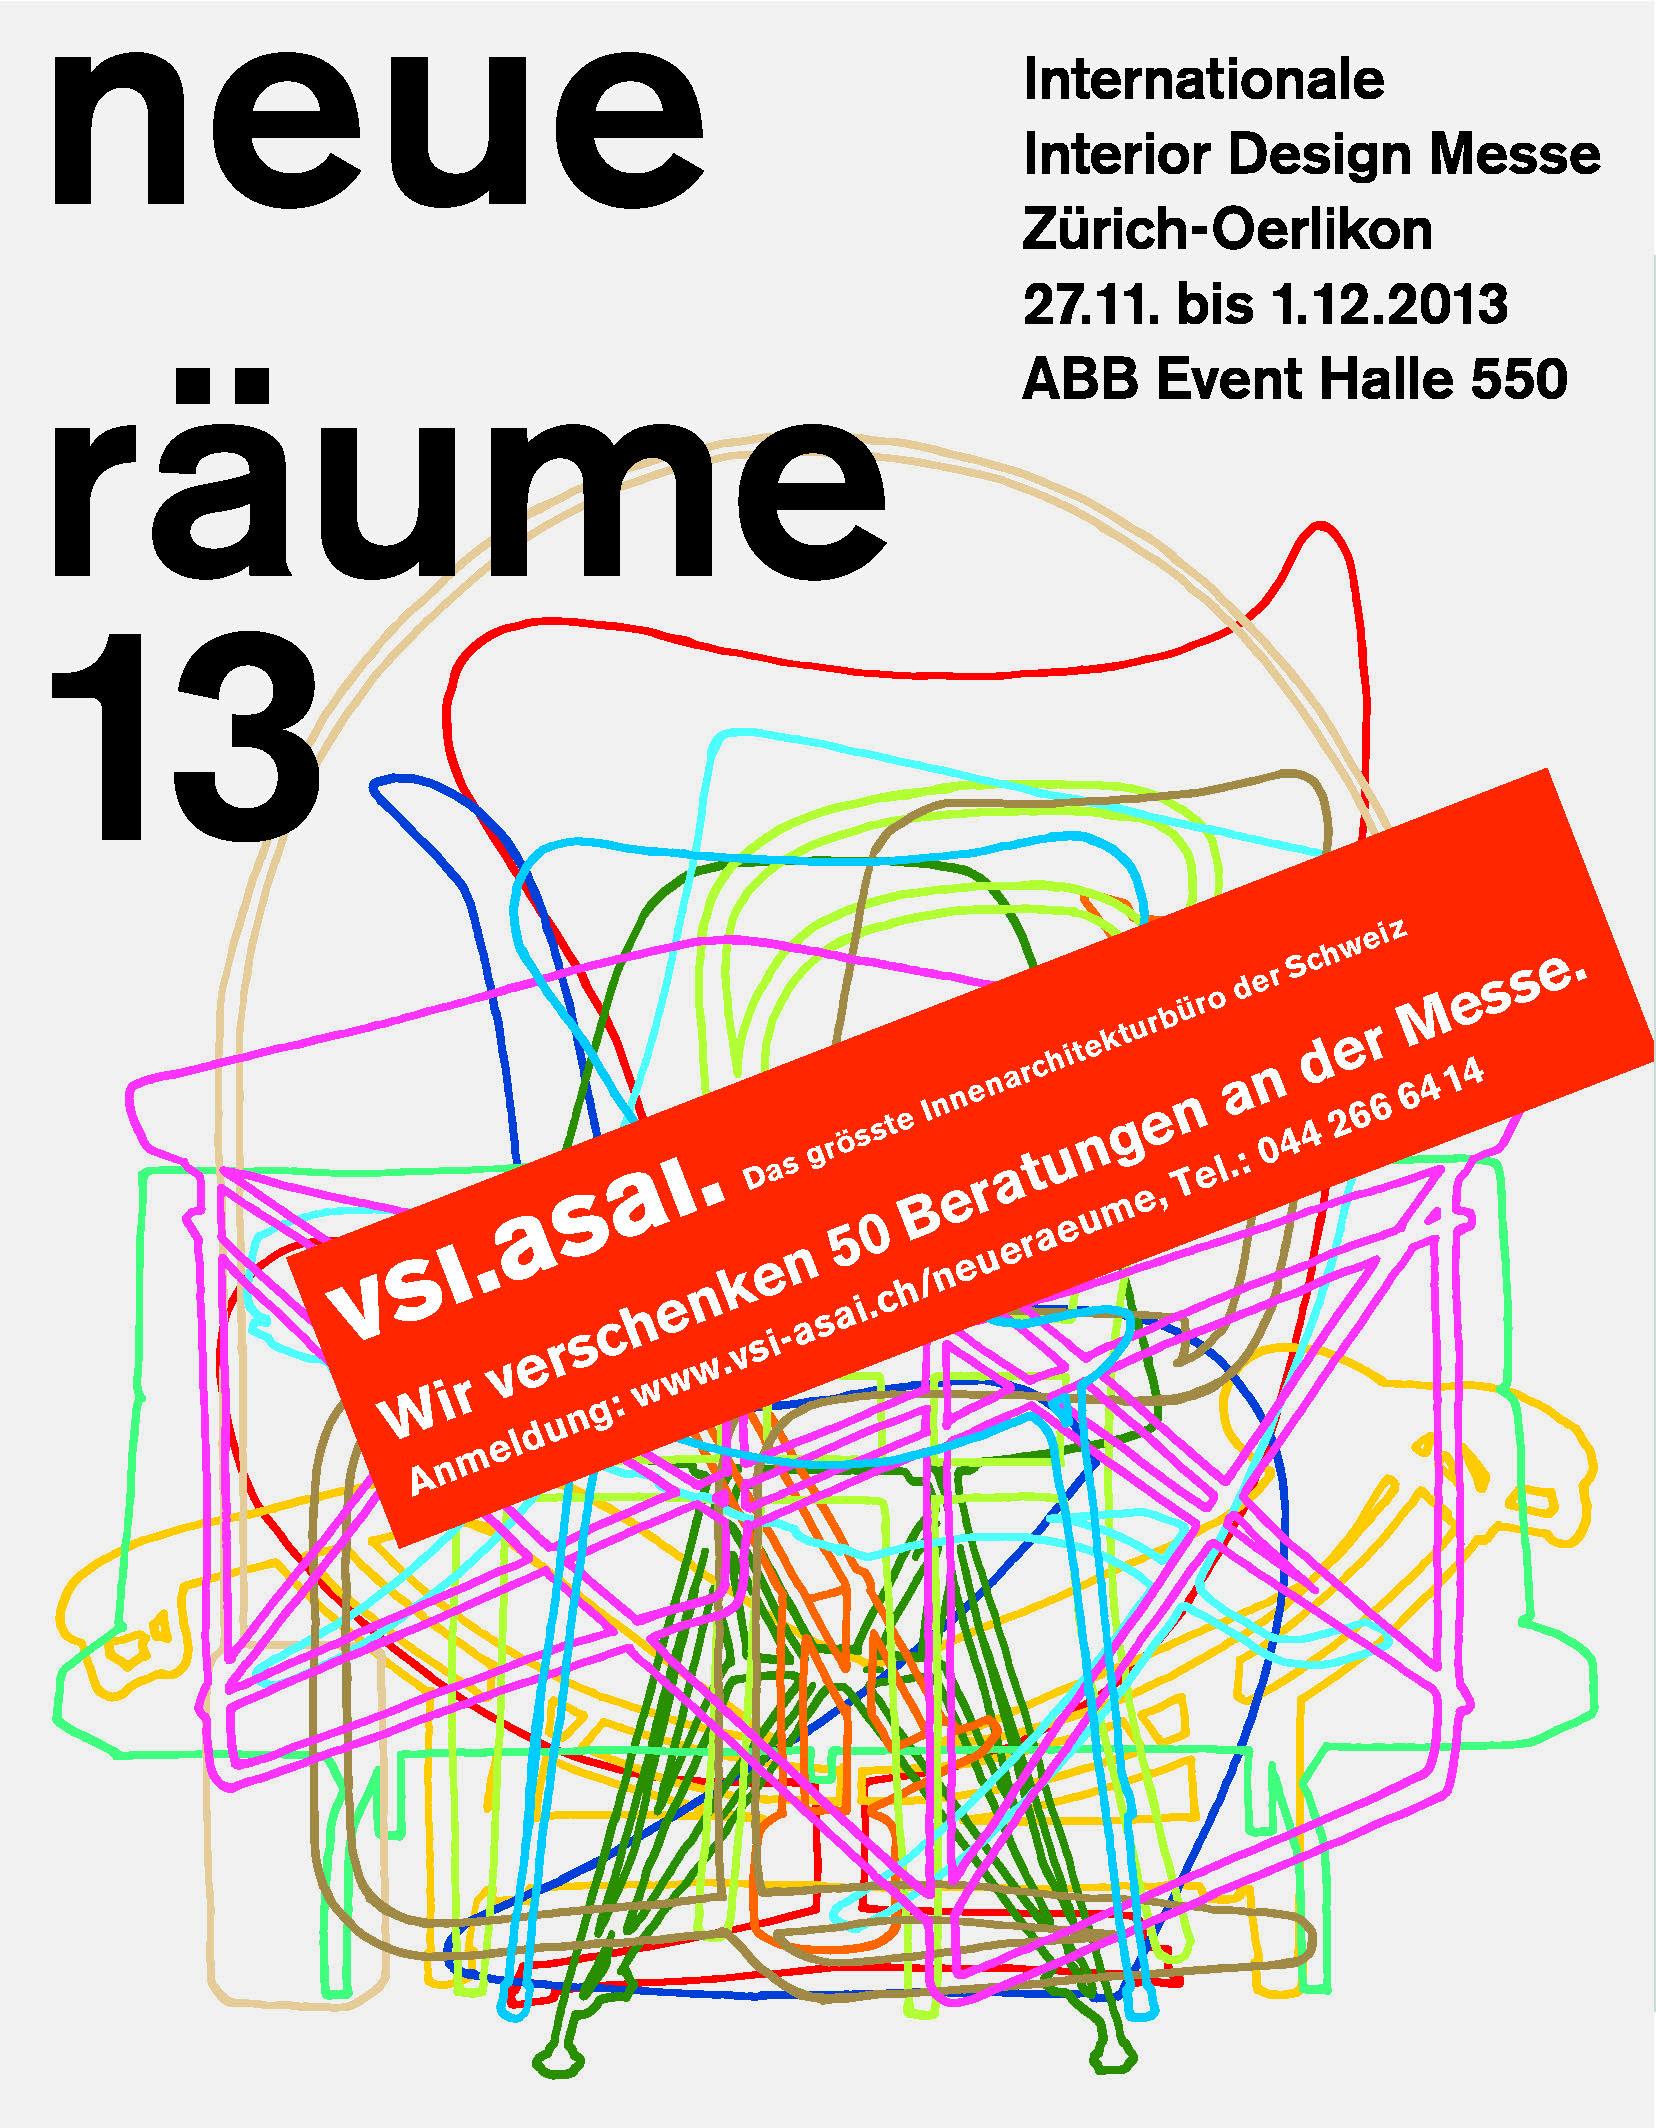 vsi.asai_florian_studer_Neue_Räume_Zürich.jpg